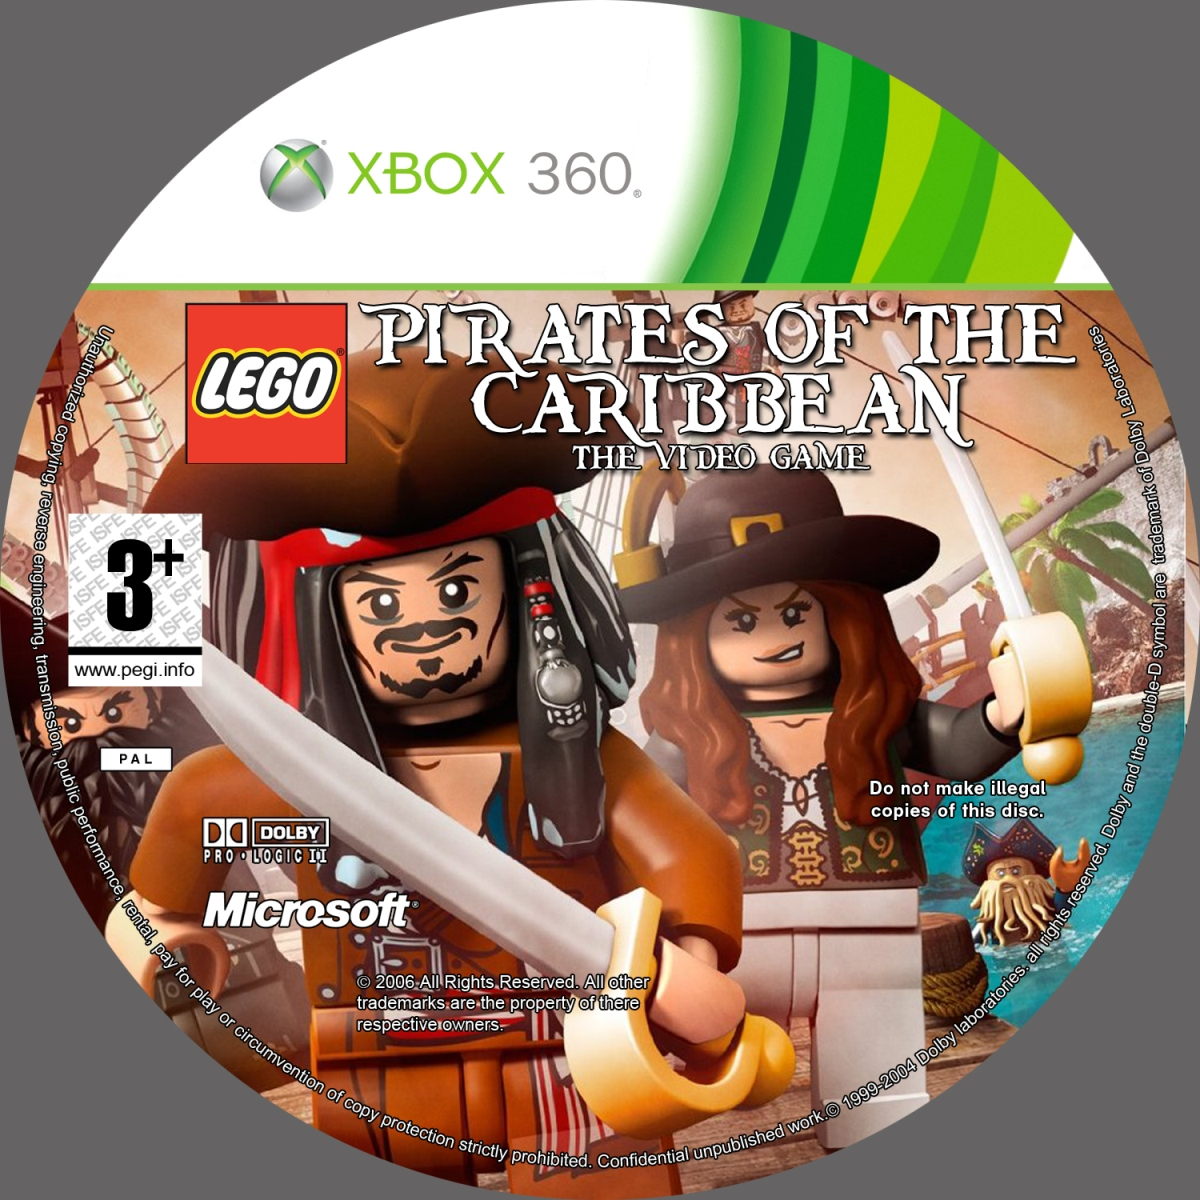 Pirates of the caribbean sex sceans nudes photos